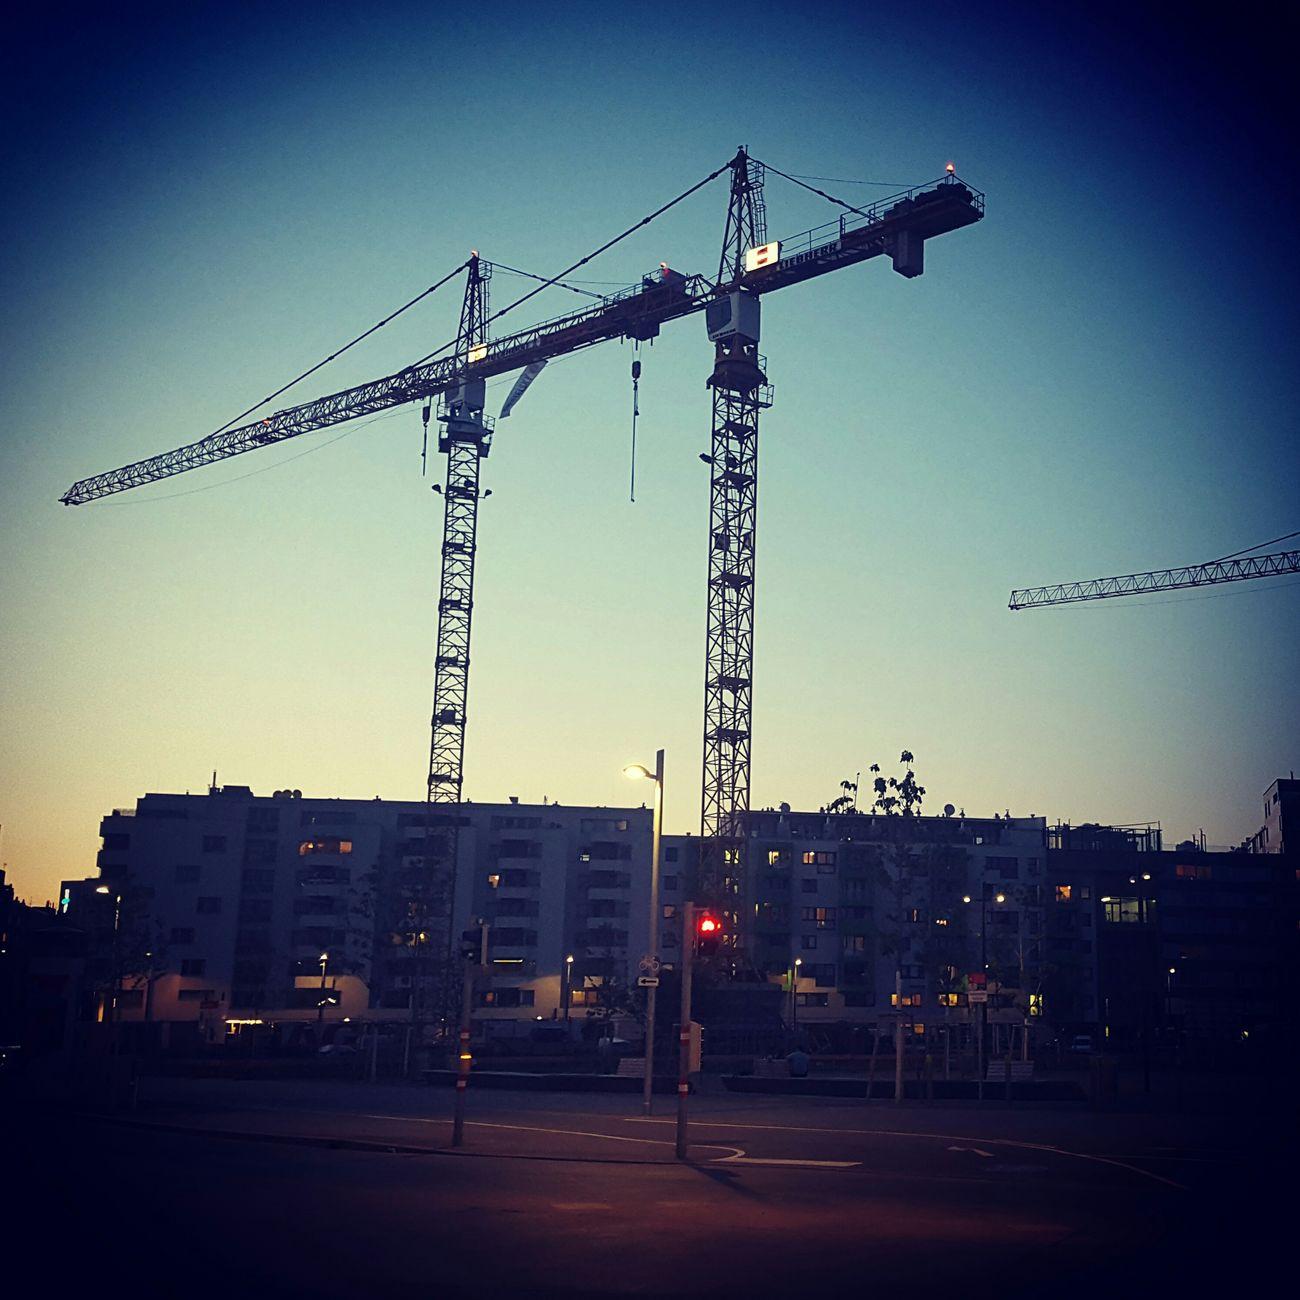 City under construction Vienna Favoritenisdasneuecool